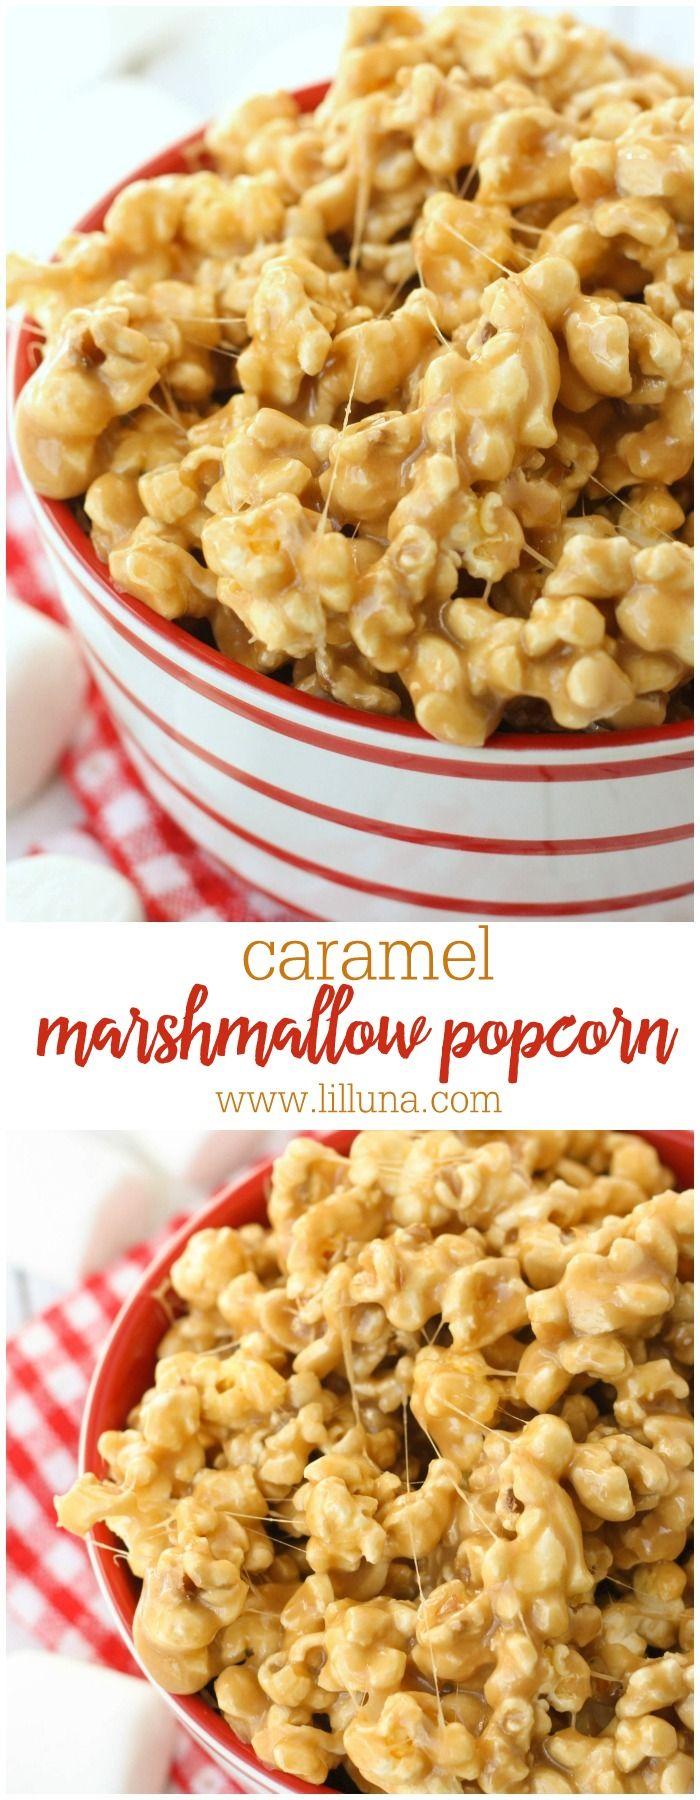 Caramel Marshmallow Popcorn | Lil Luna